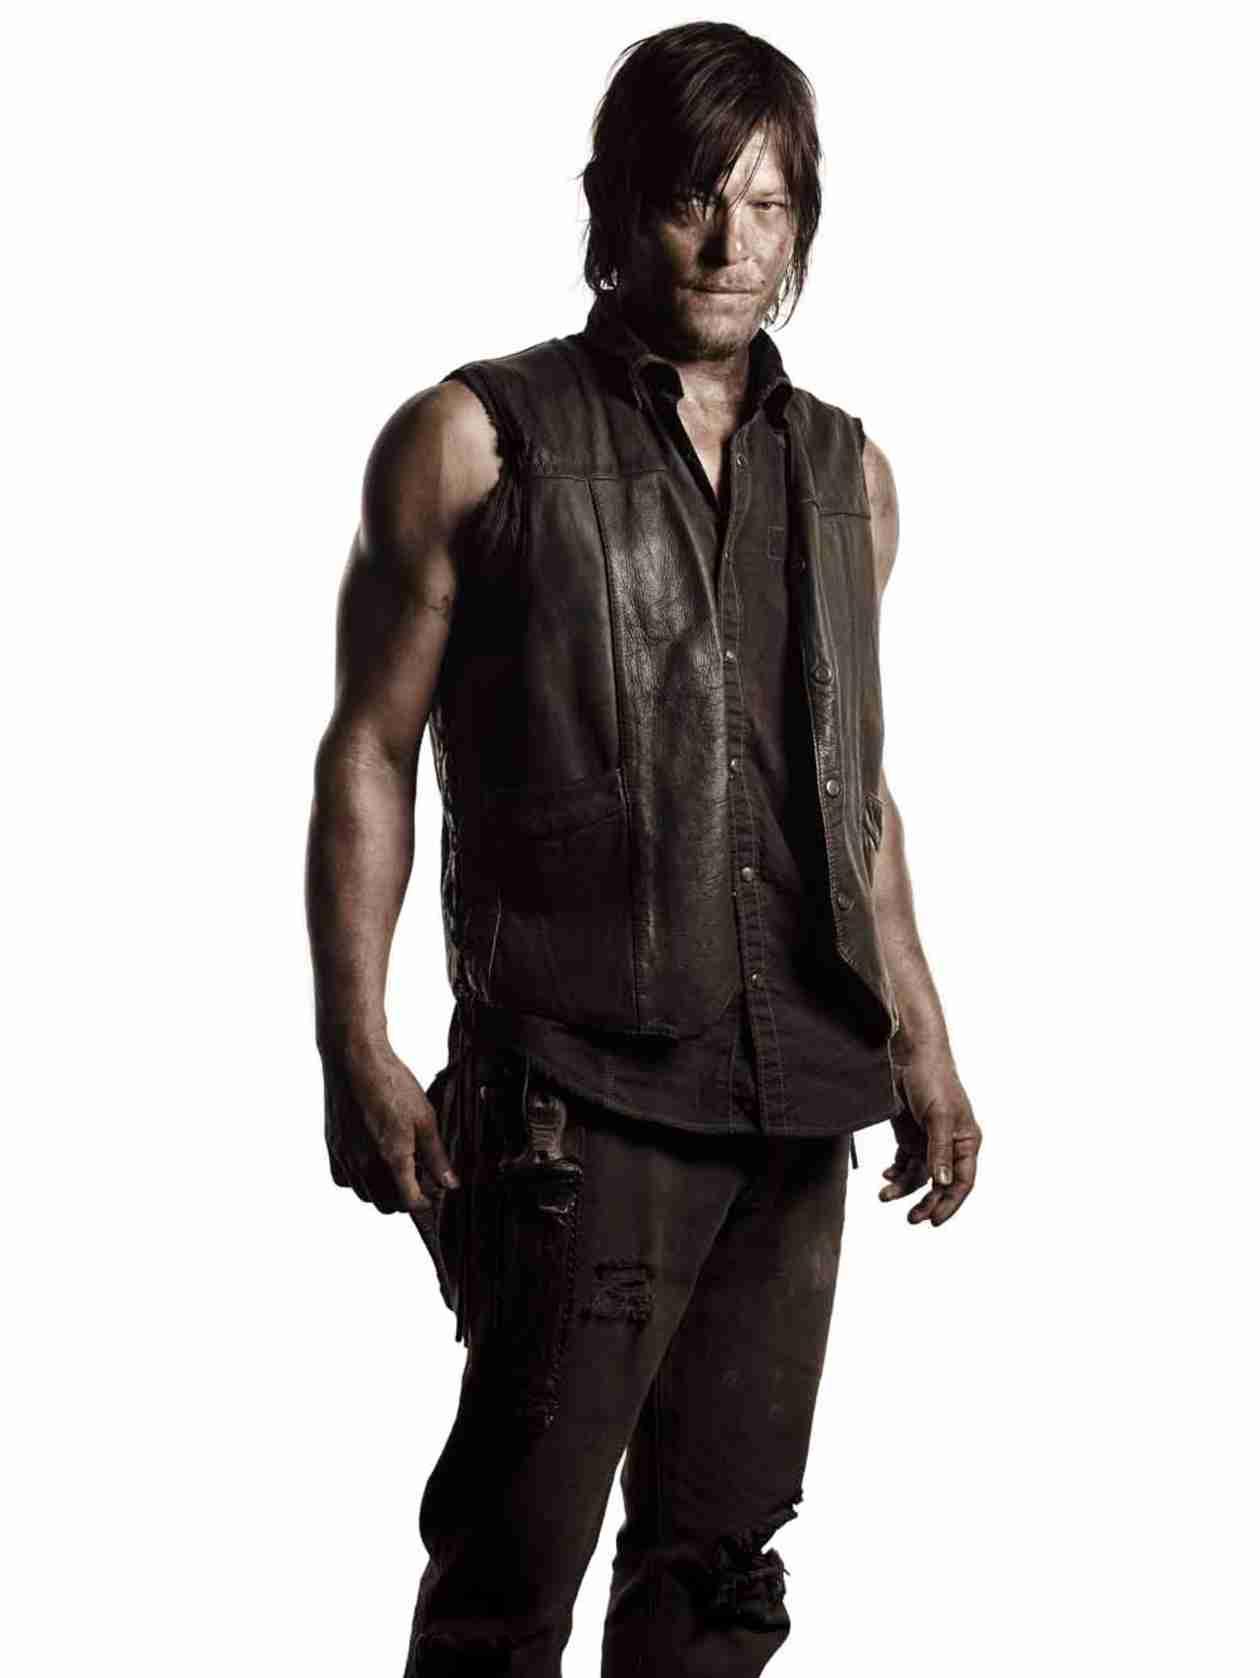 Daryl Dixon Takes Aim in New Walking Dead Season 5 Photos